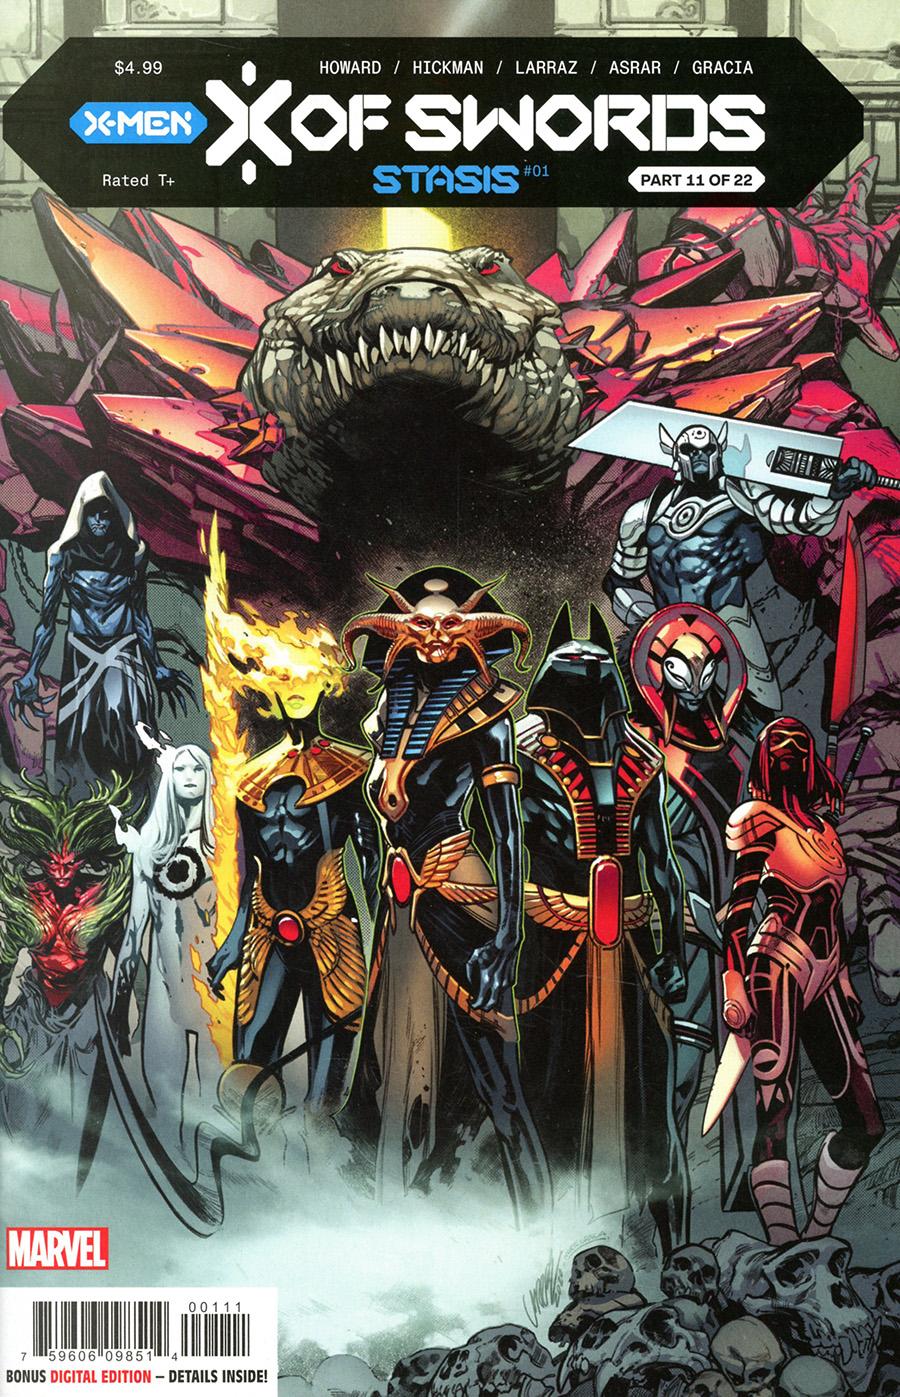 X Of Swords Stasis #1 Cover A Regular Pepe Larraz Cover (X Of Swords Part 11)